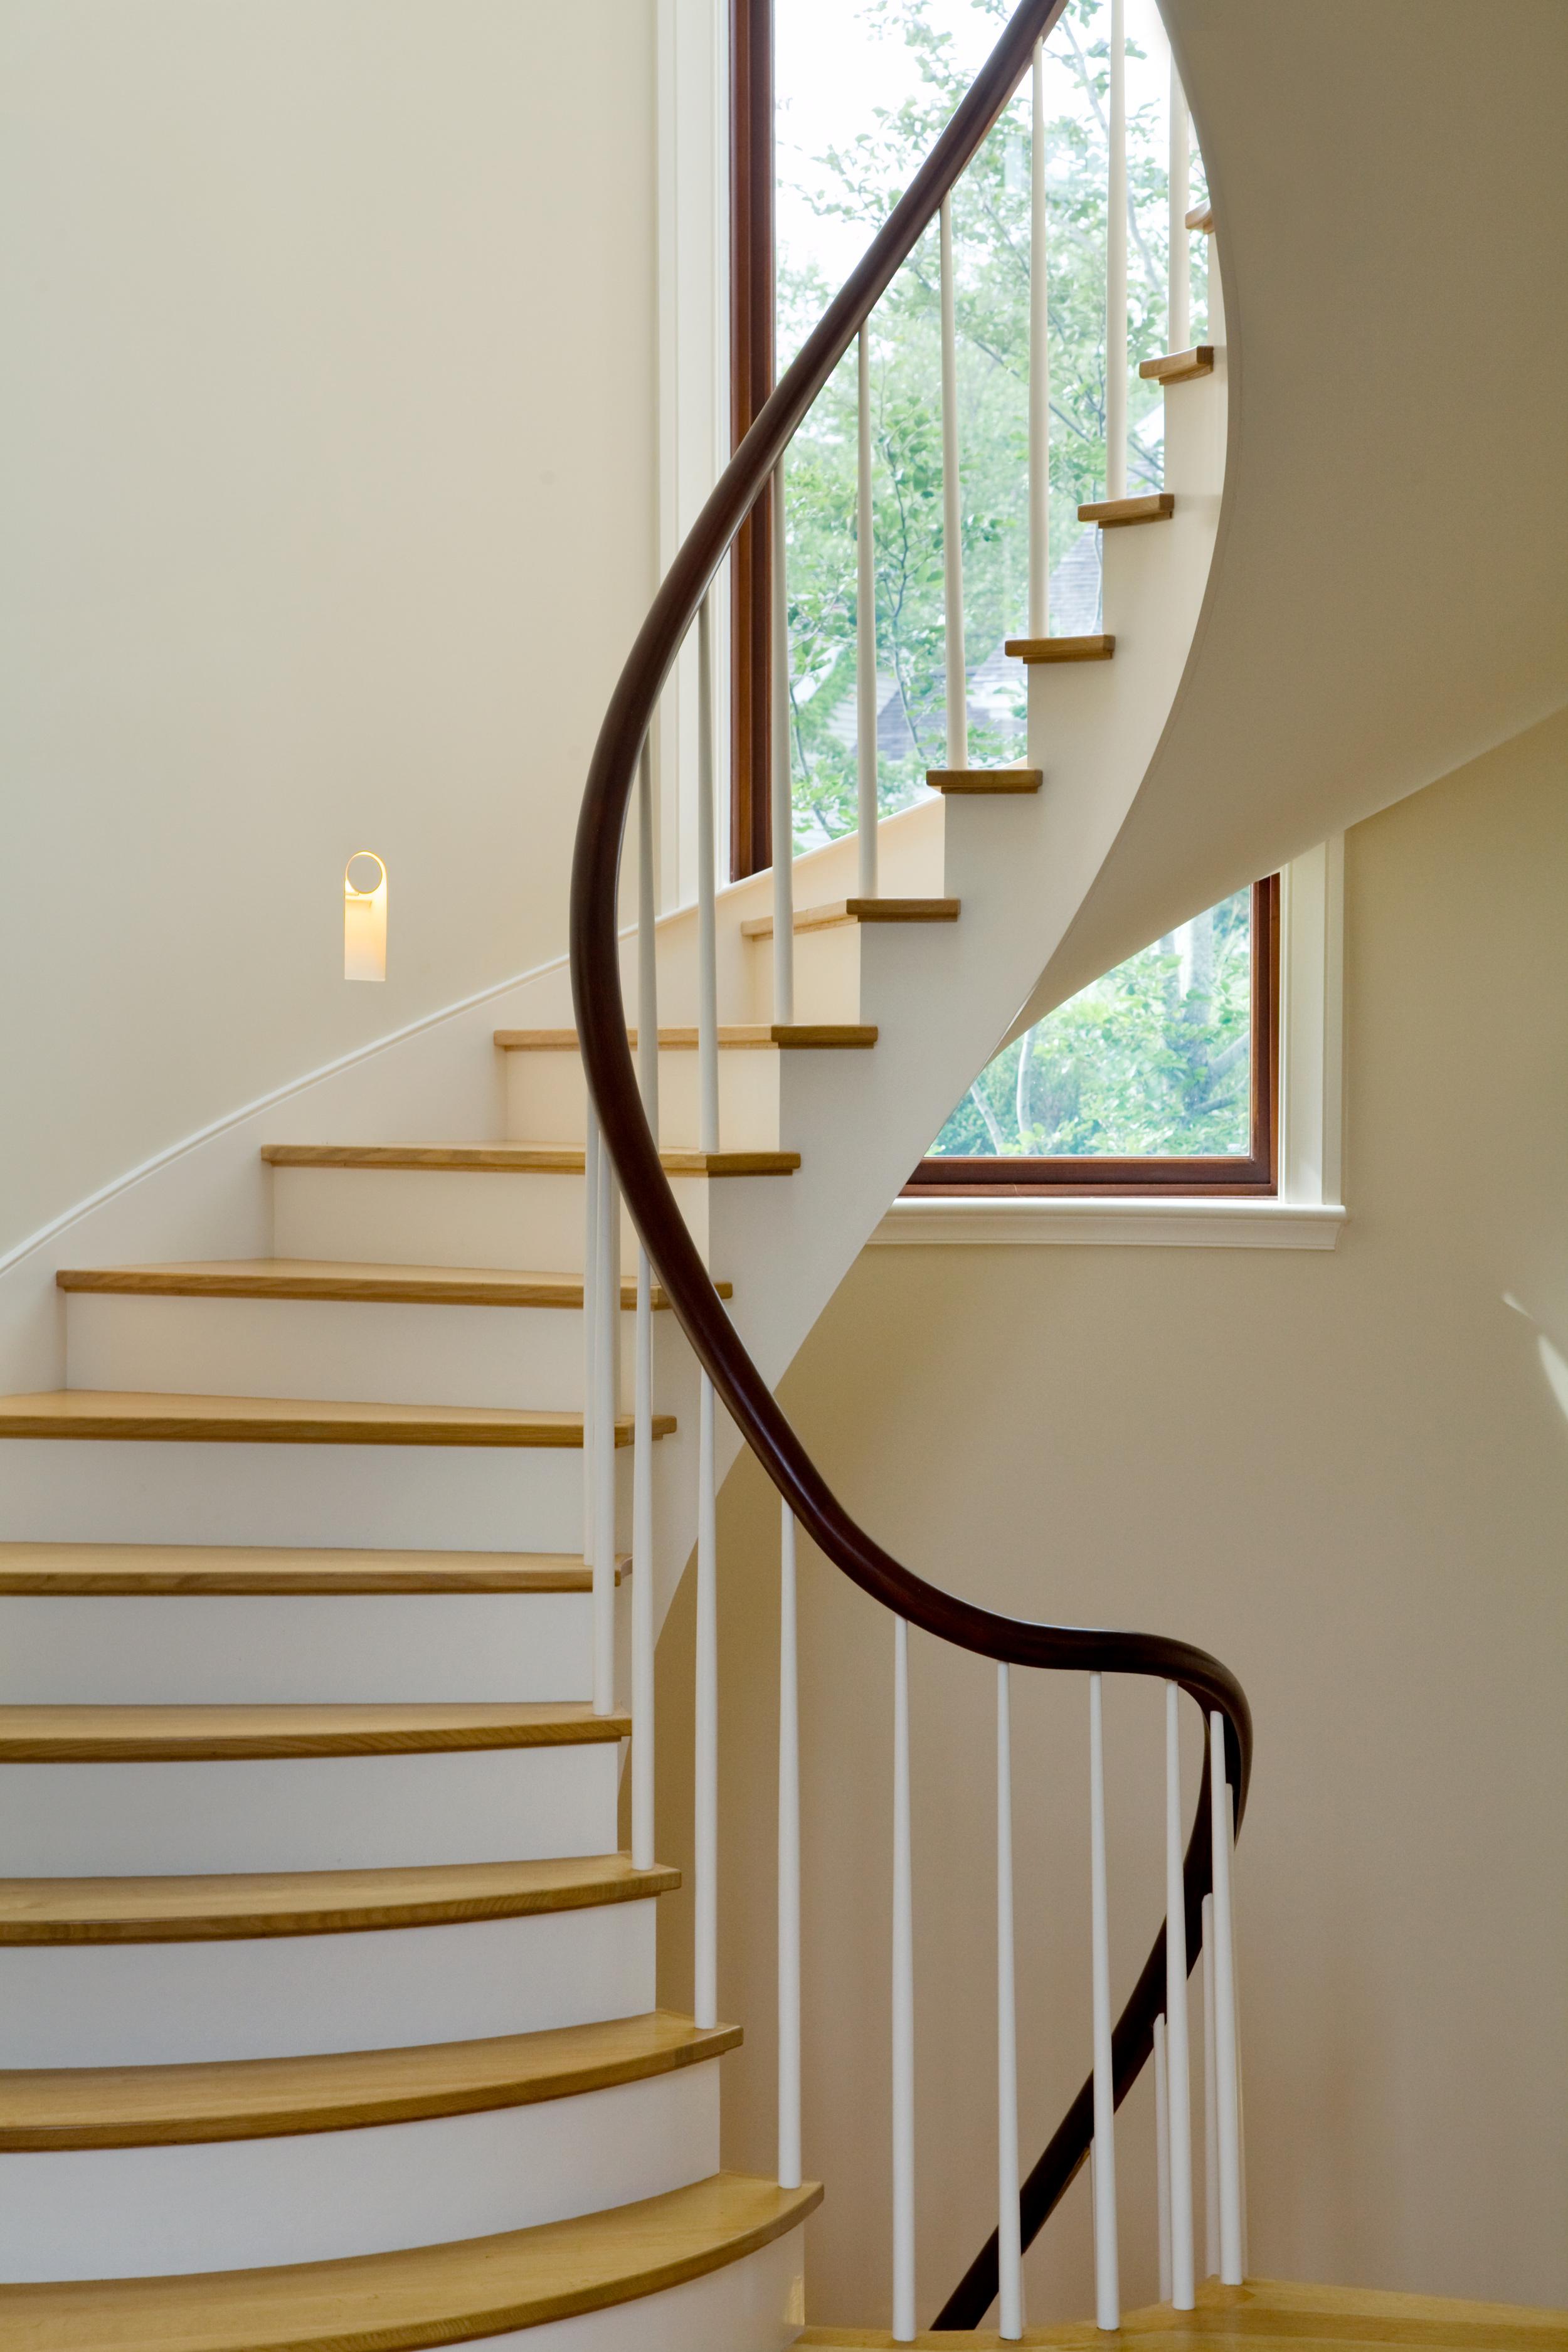 Cape_Cod_Doreve_stairs_2.jpg